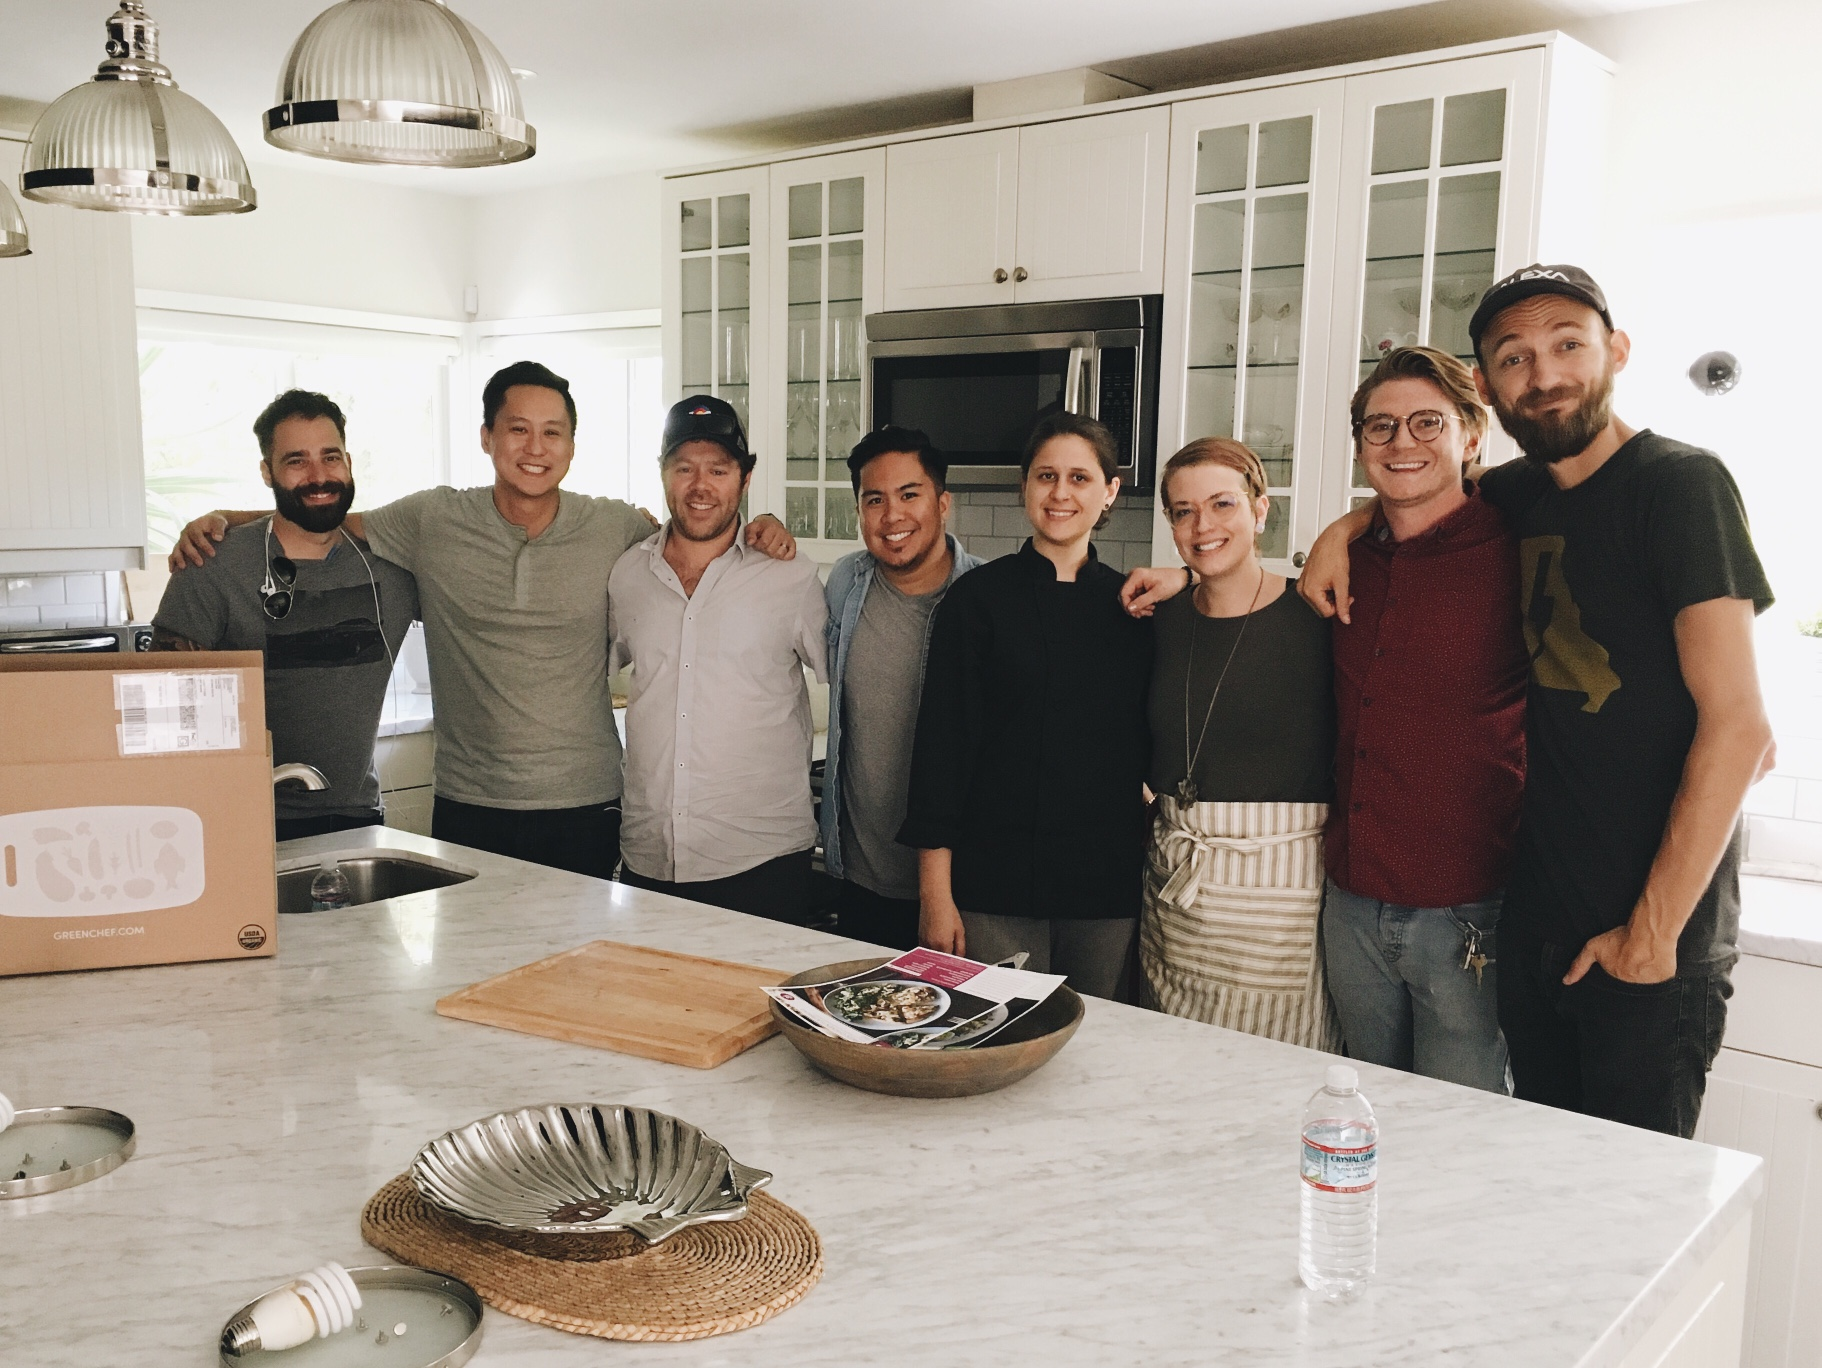 Pictured (left to right): David Gielan (Director), Phil Shen (GC, Content), Michael Joseph (GC, CEO),  Mike V , Dana Murrell (GC, Executive Chef), Sara Heilman (GC, Chef), Matt Marenyi (Producer), Jack Caswell (DP)